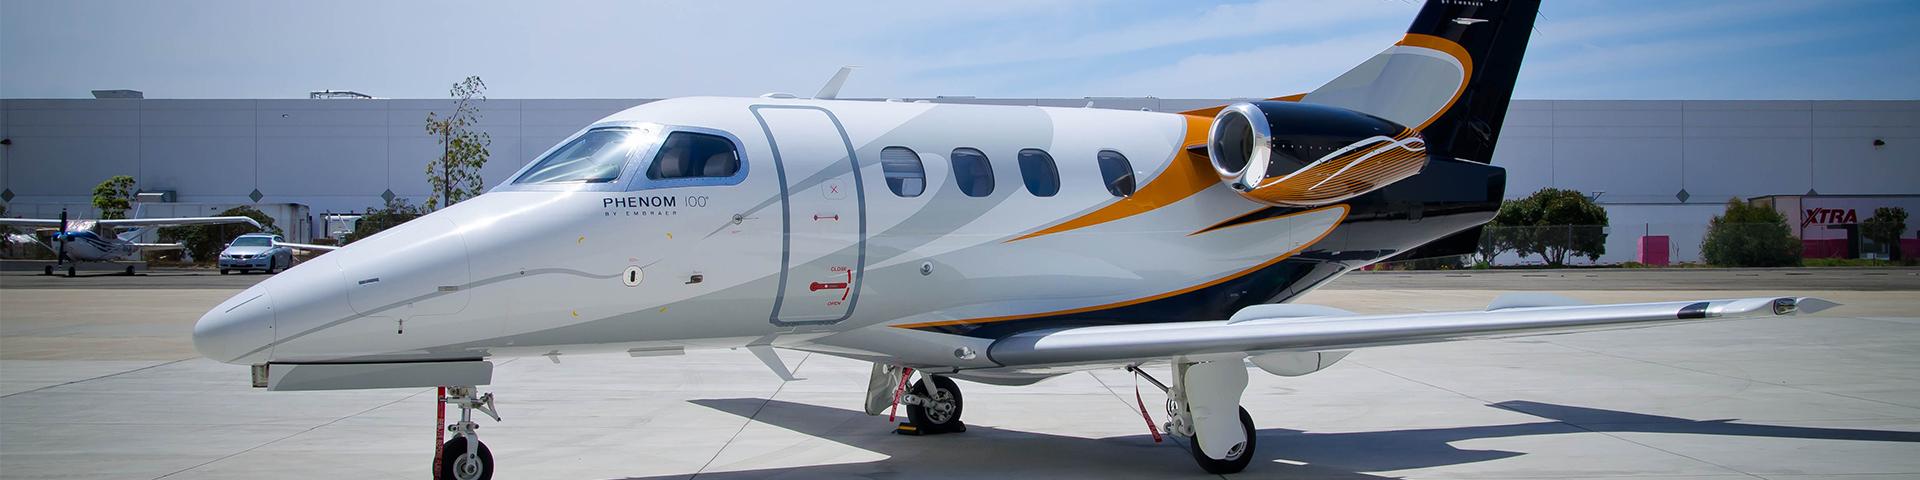 Phenom 100 Private Jet1 - Phenom 100 Private Jet